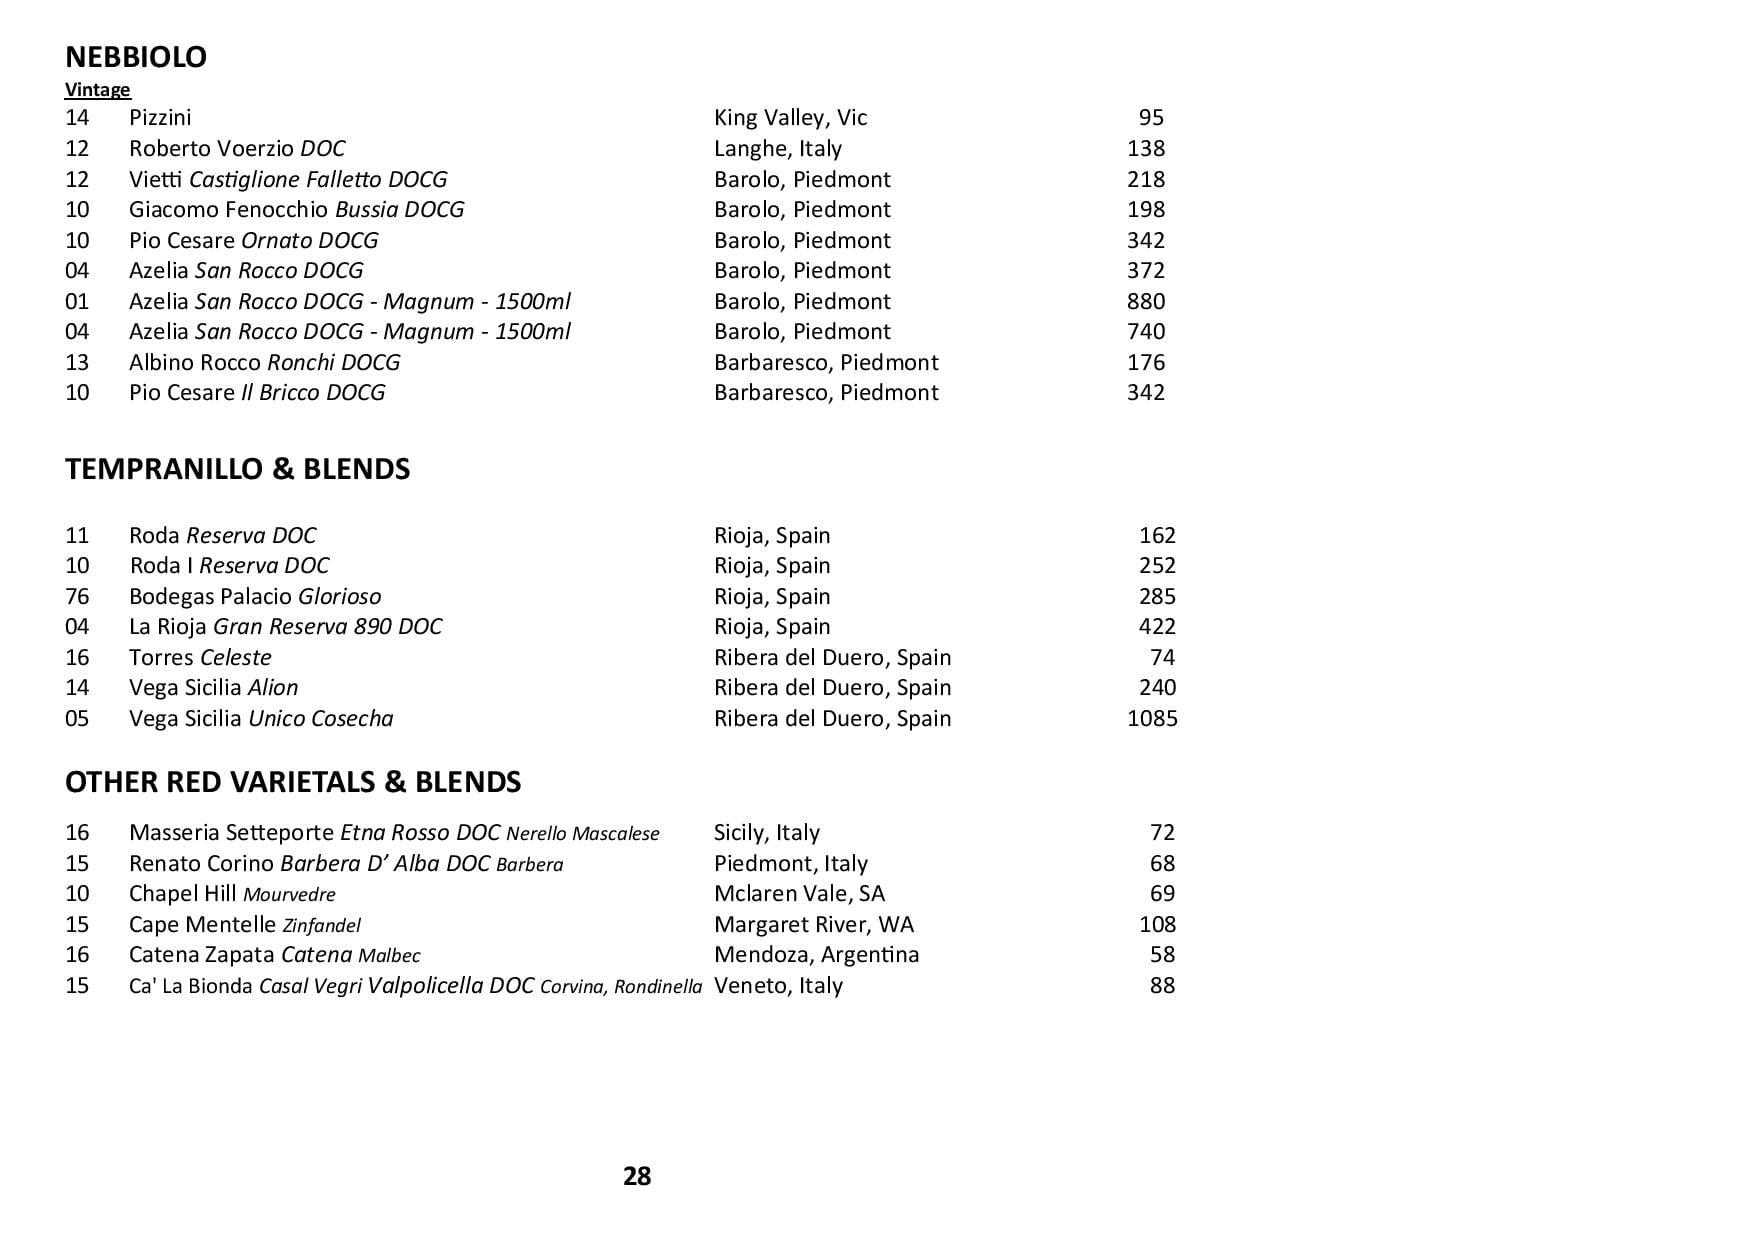 Sails Wine List 2020 Page 028